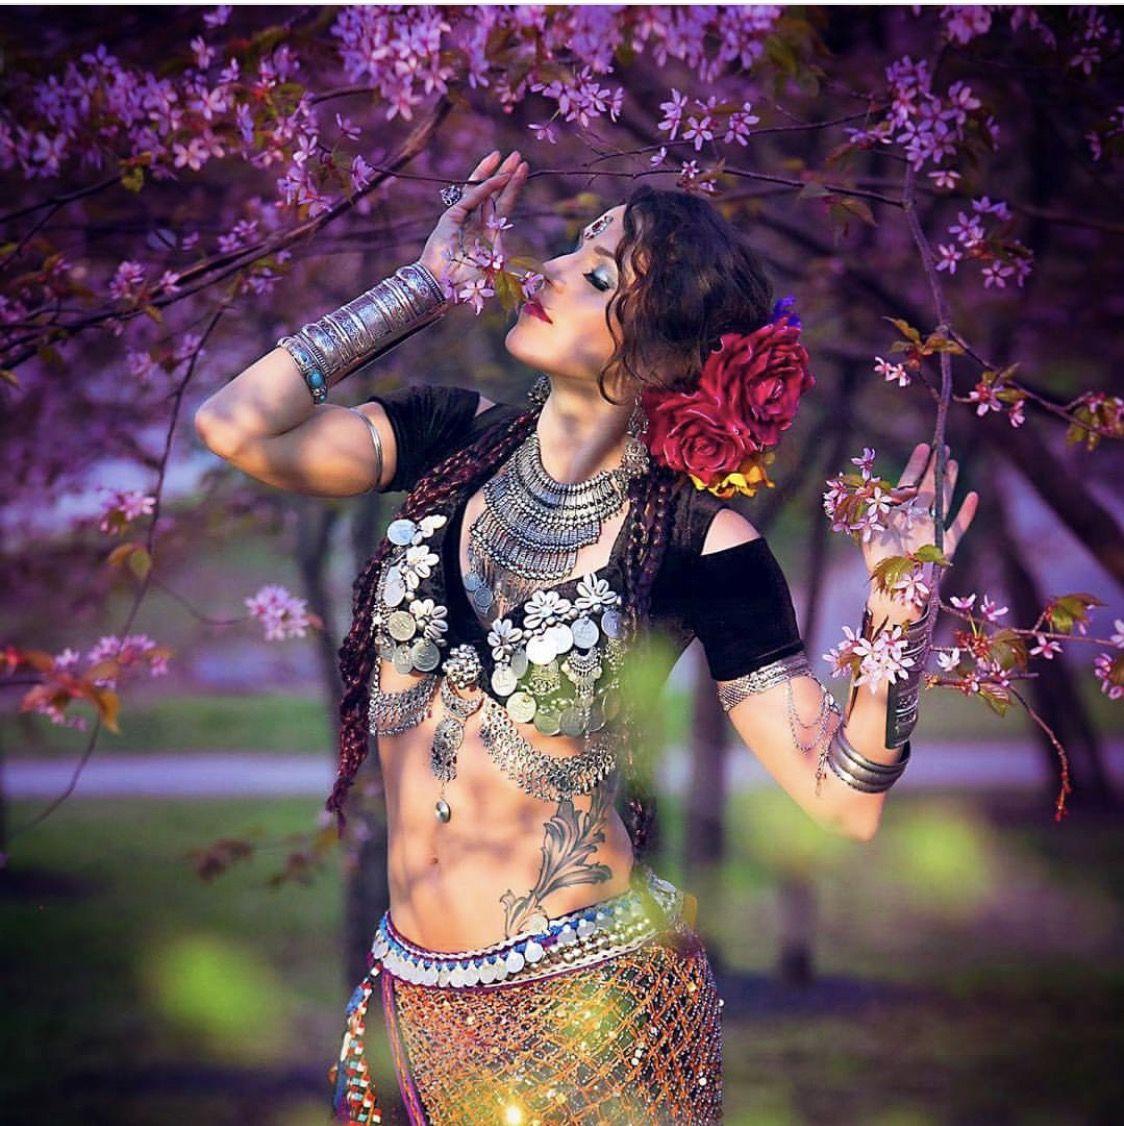 Pin de Heloisa Ignacio en Mulheres do Universo | Pinterest ...